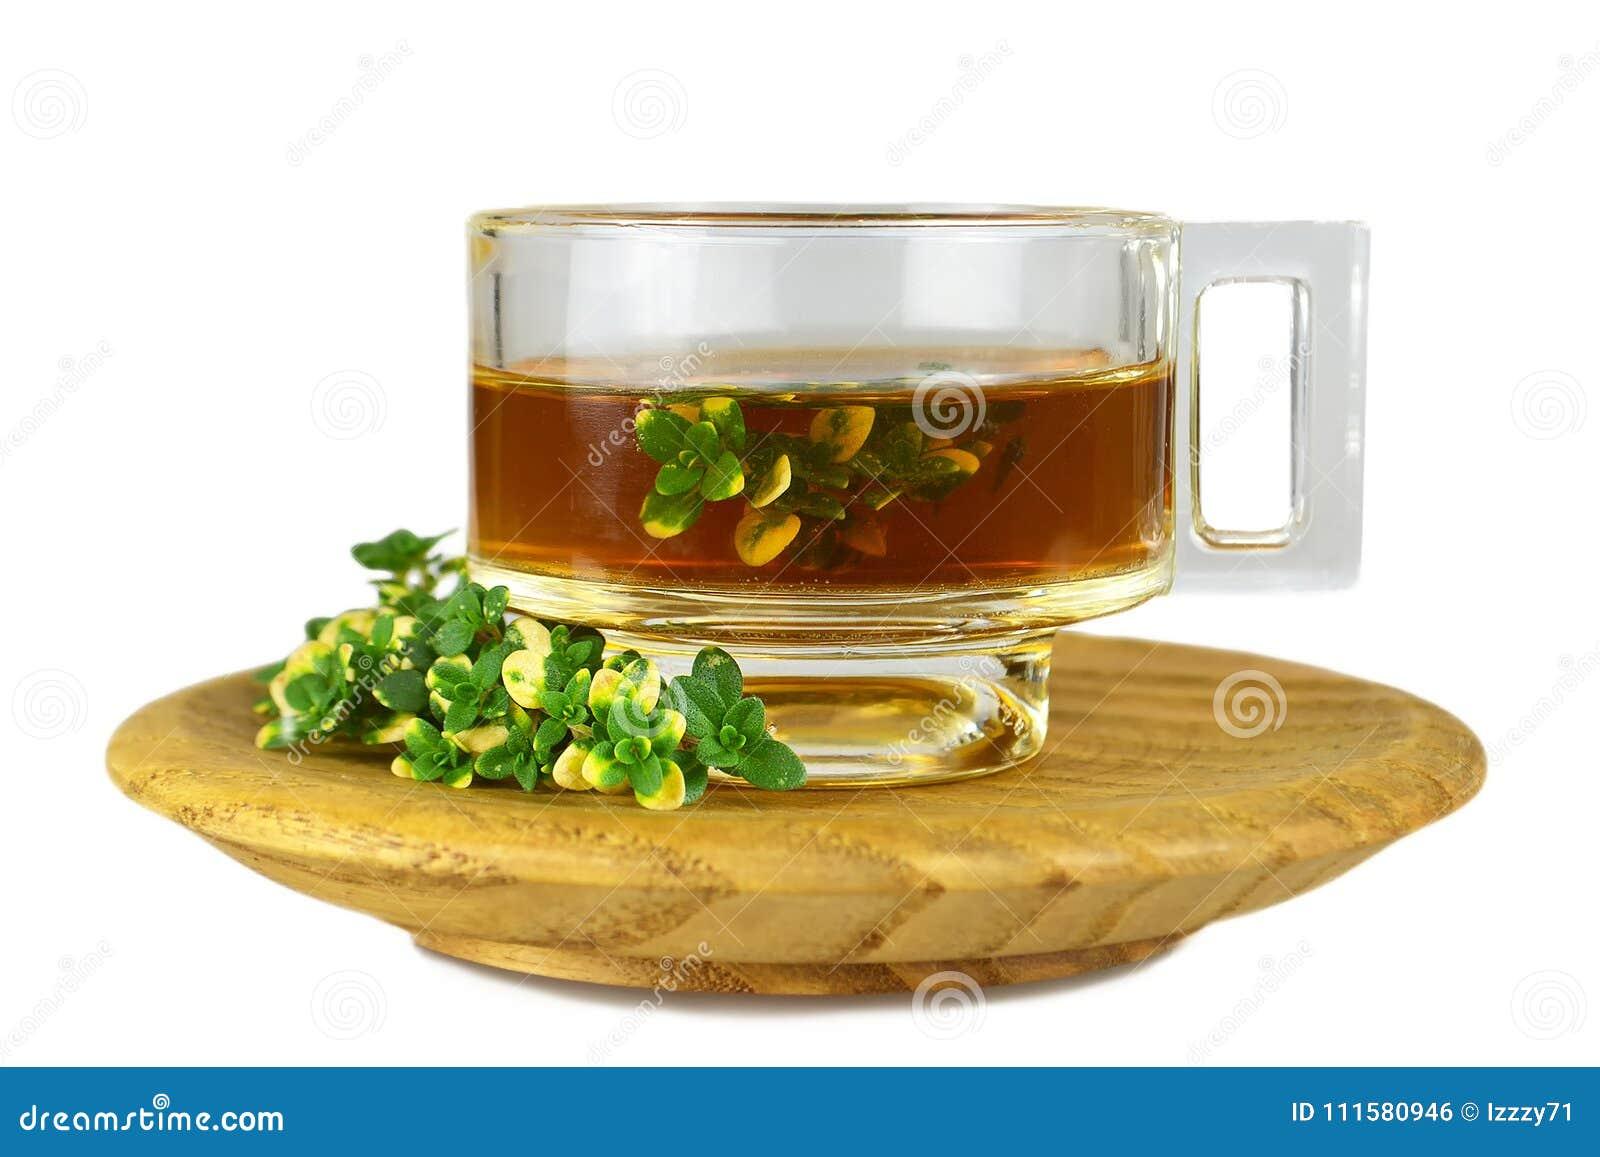 Thyme tea isolated on white